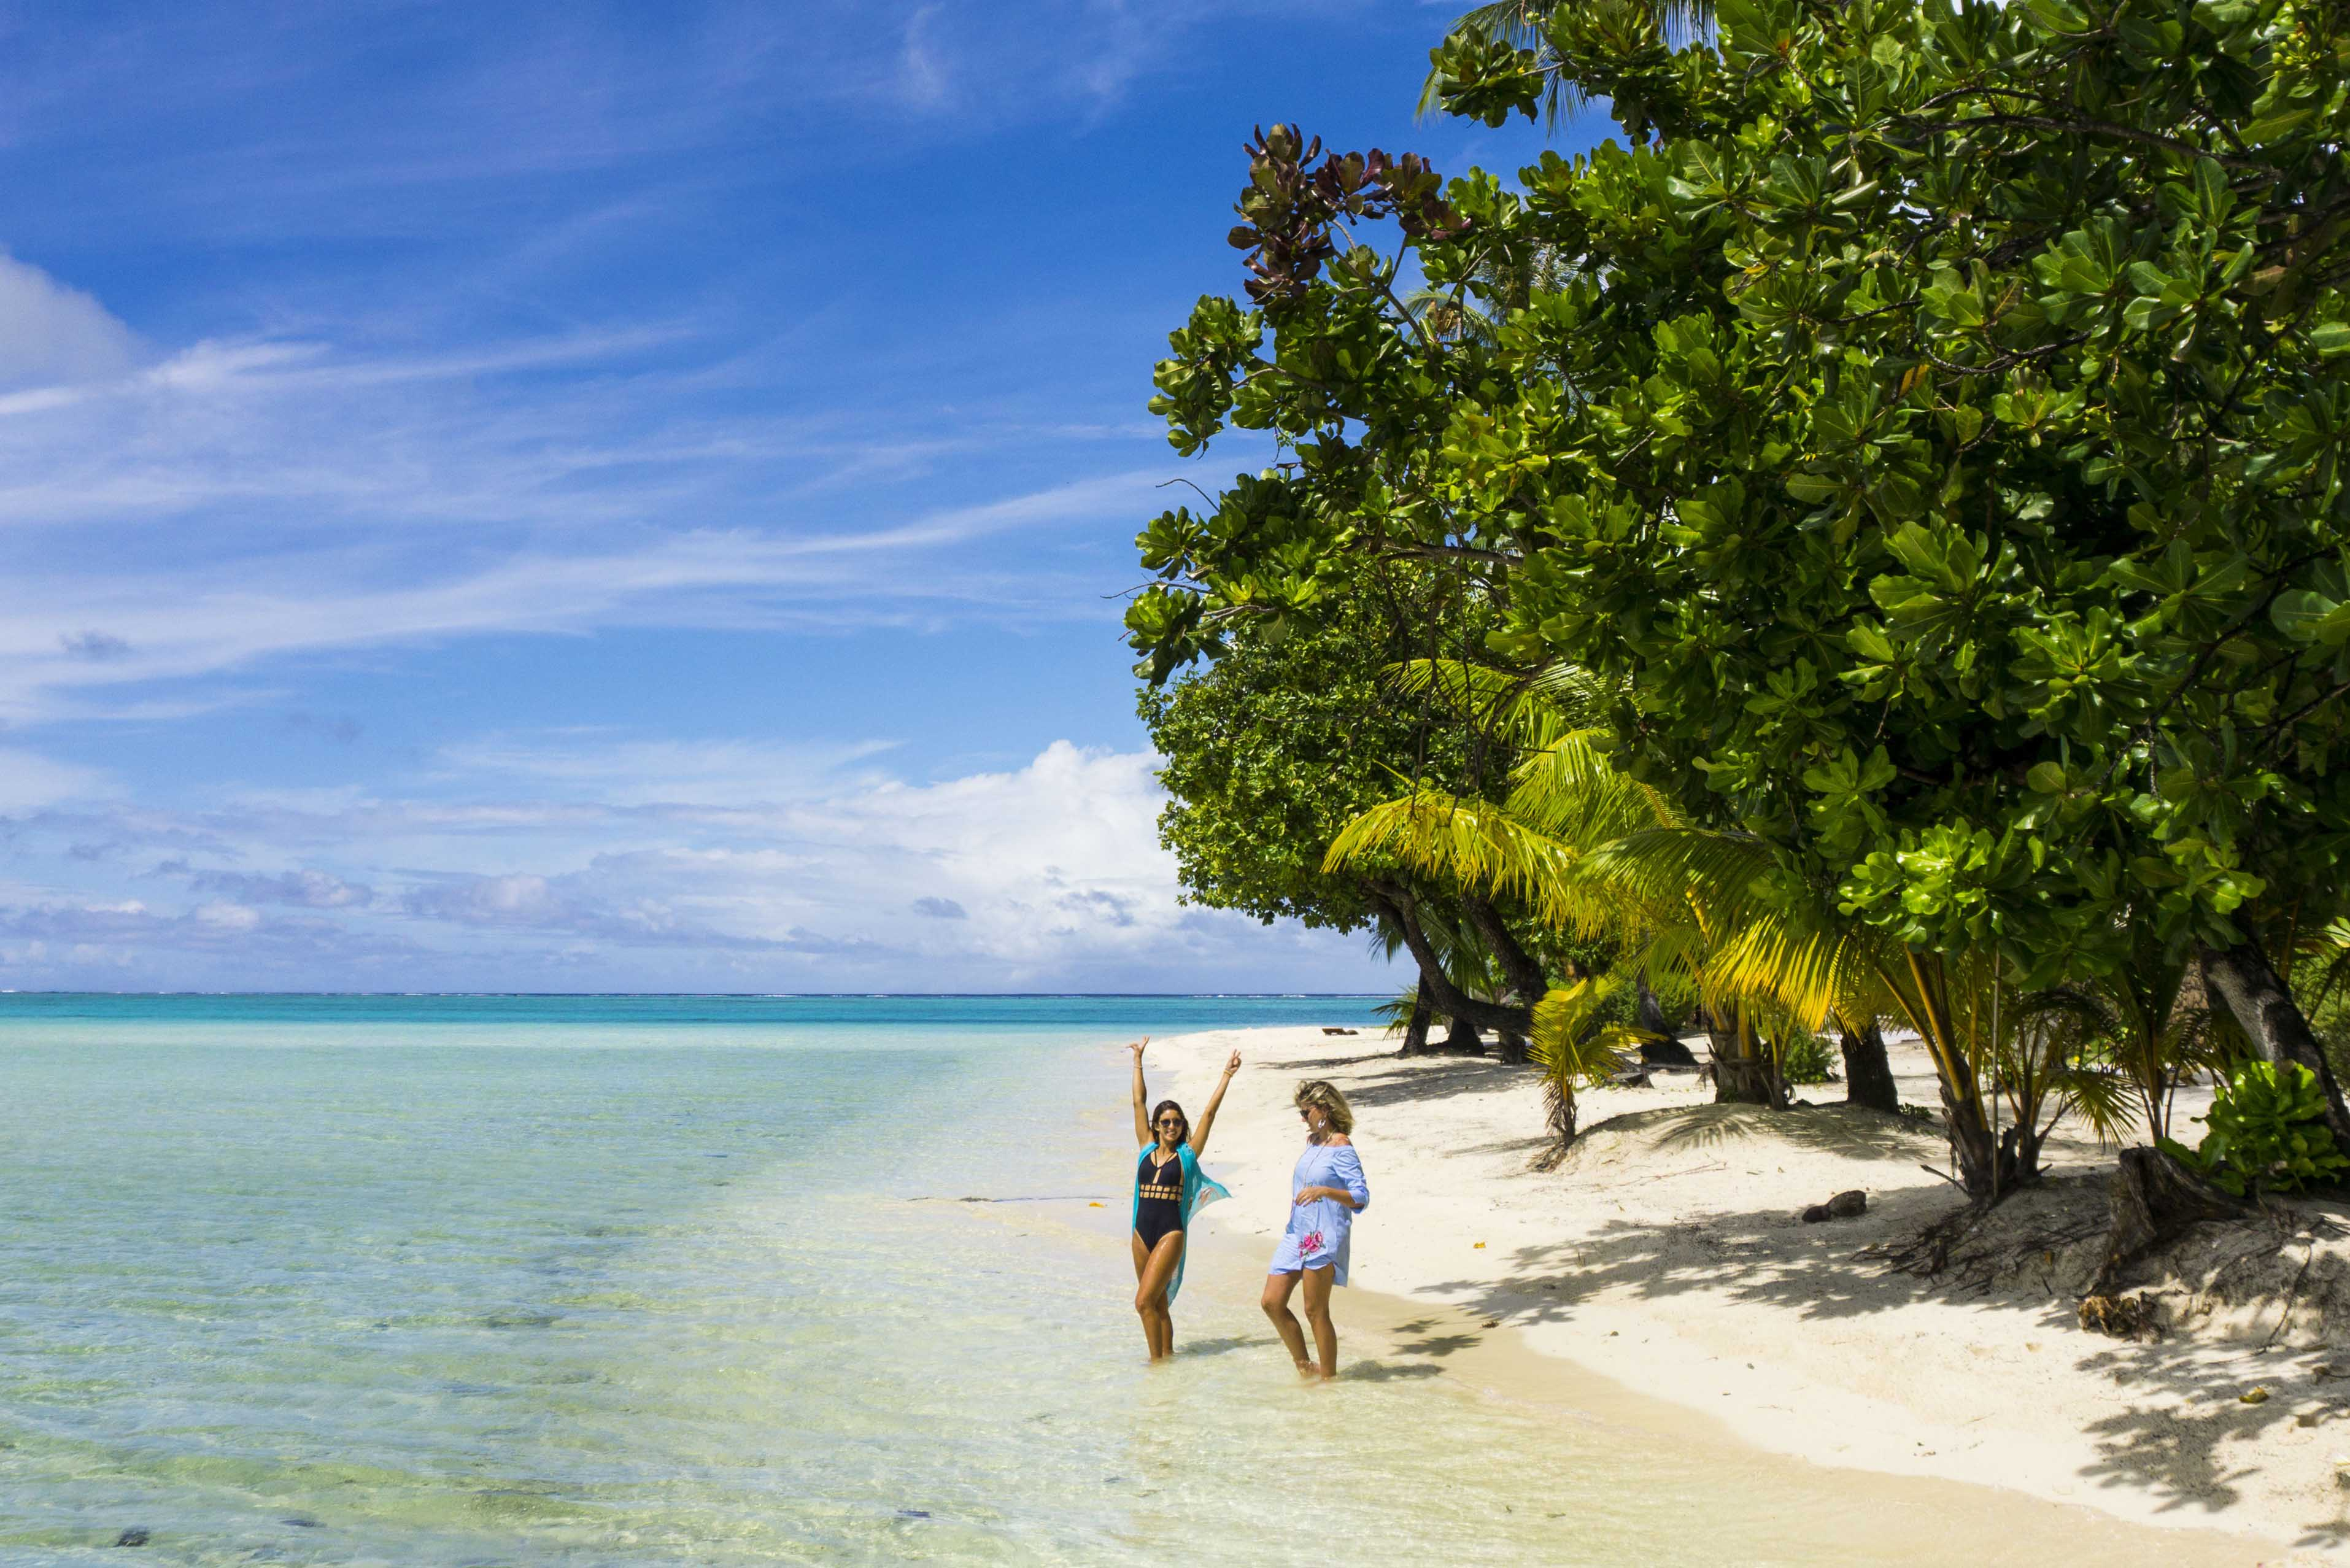 Praia na qual as beach villas estão - lindas, né?! Le Taha'a Island Resort